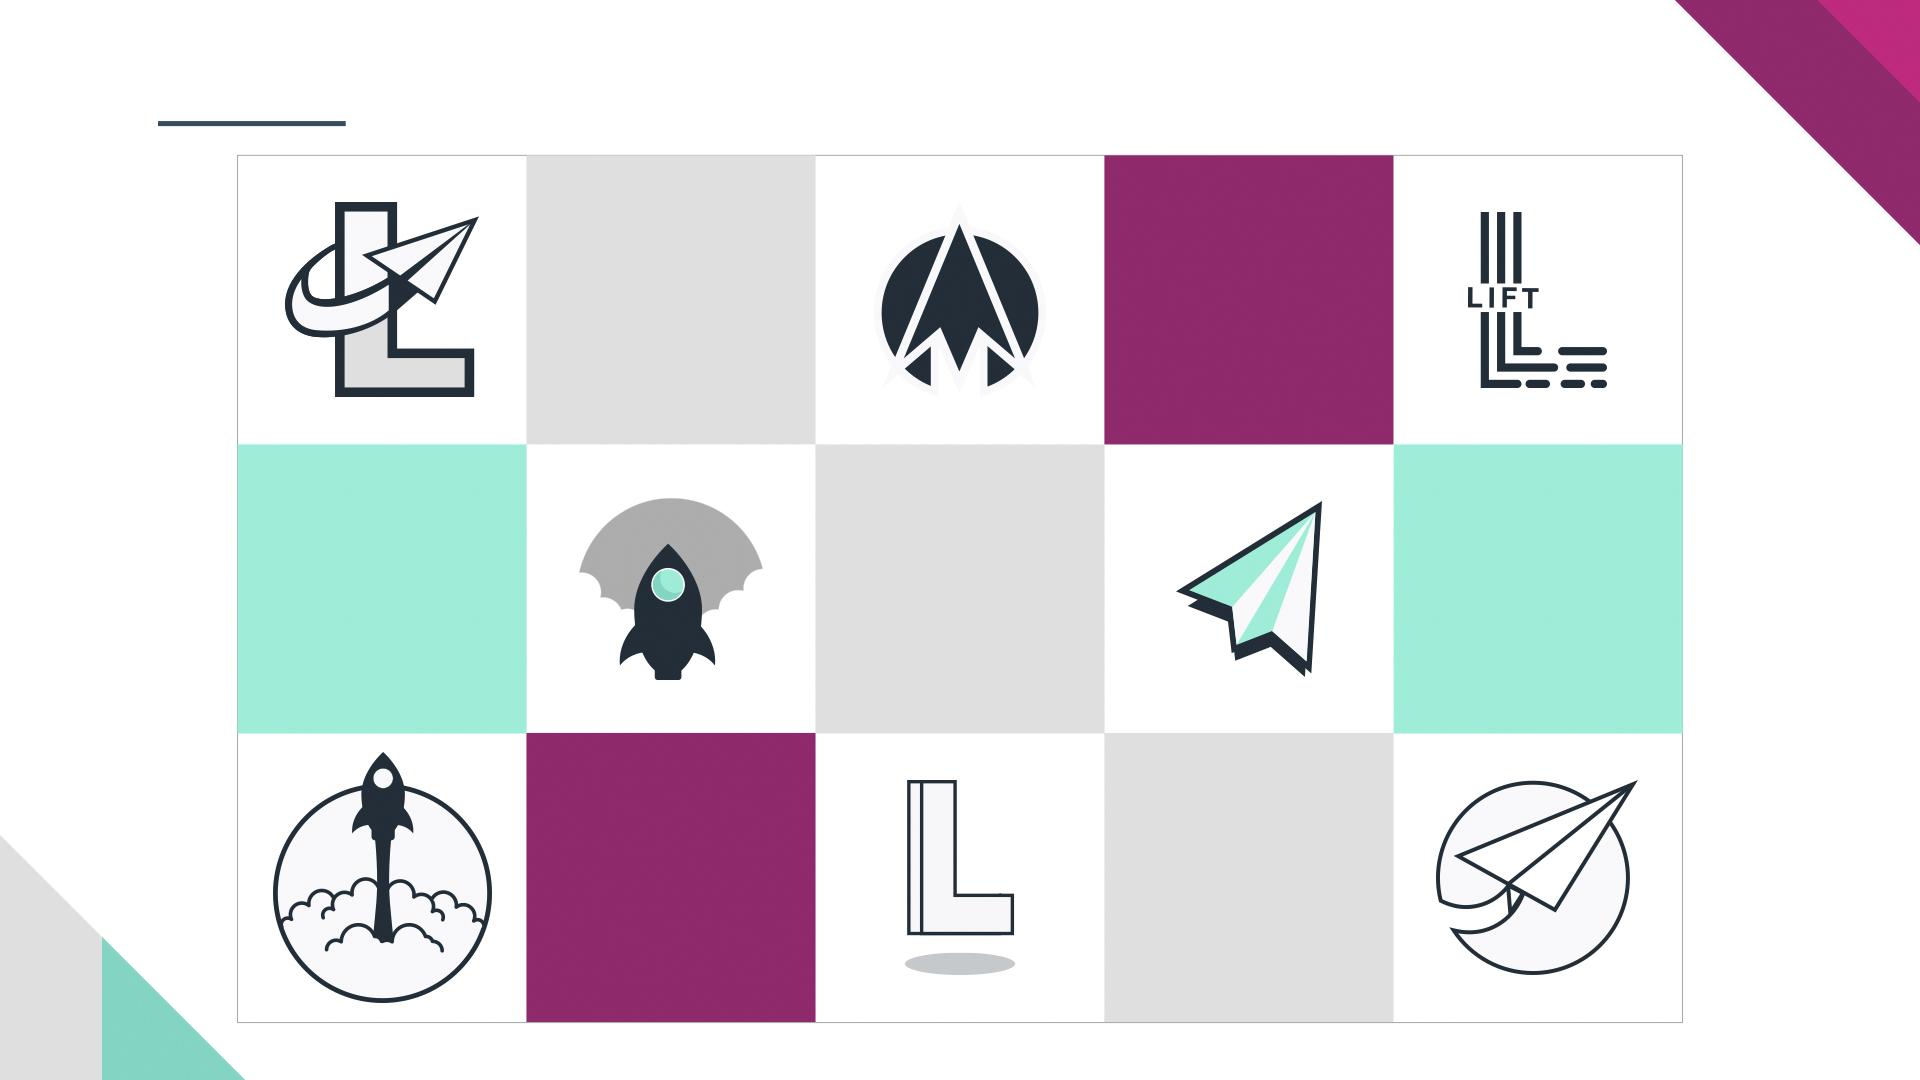 Lift_logo.001